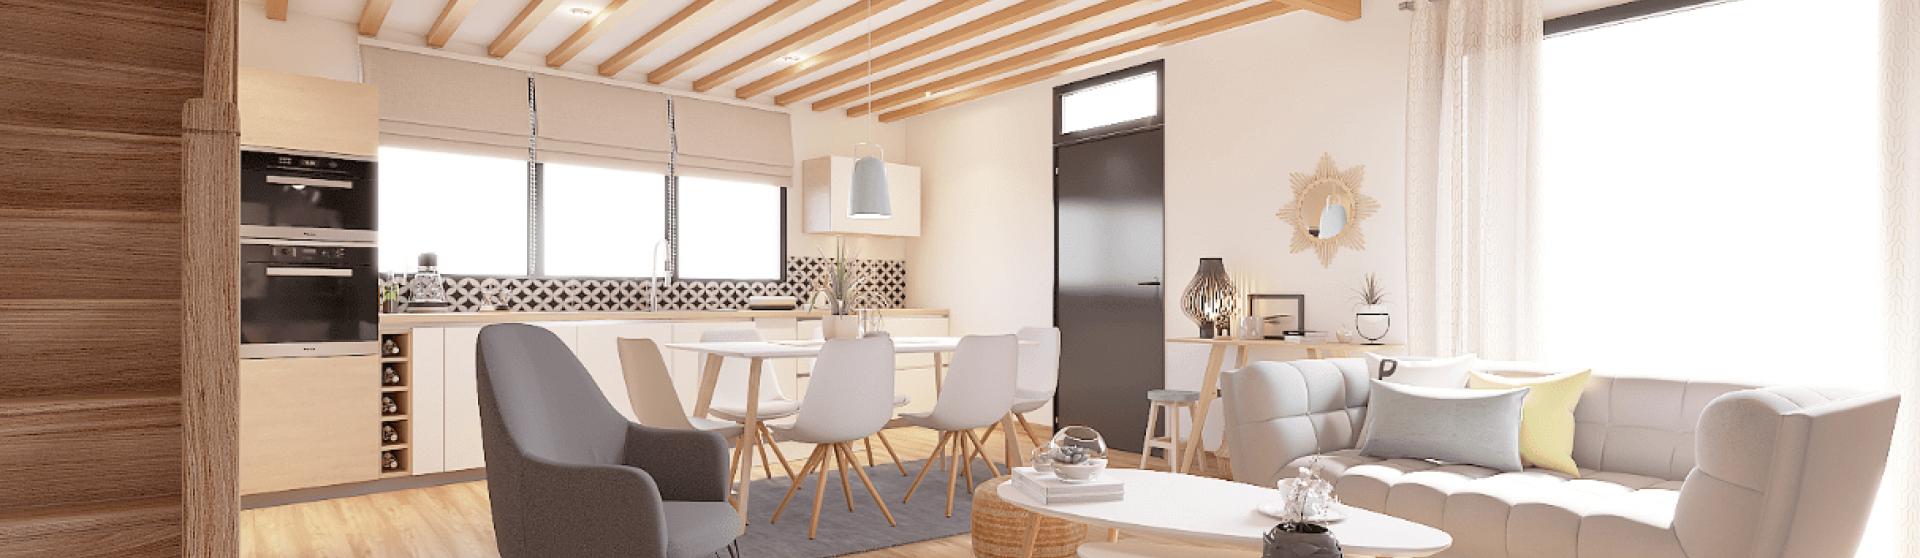 Plateau à rénover à vendre Ste-Euphémie (Ain) - 105 m² / VENDU